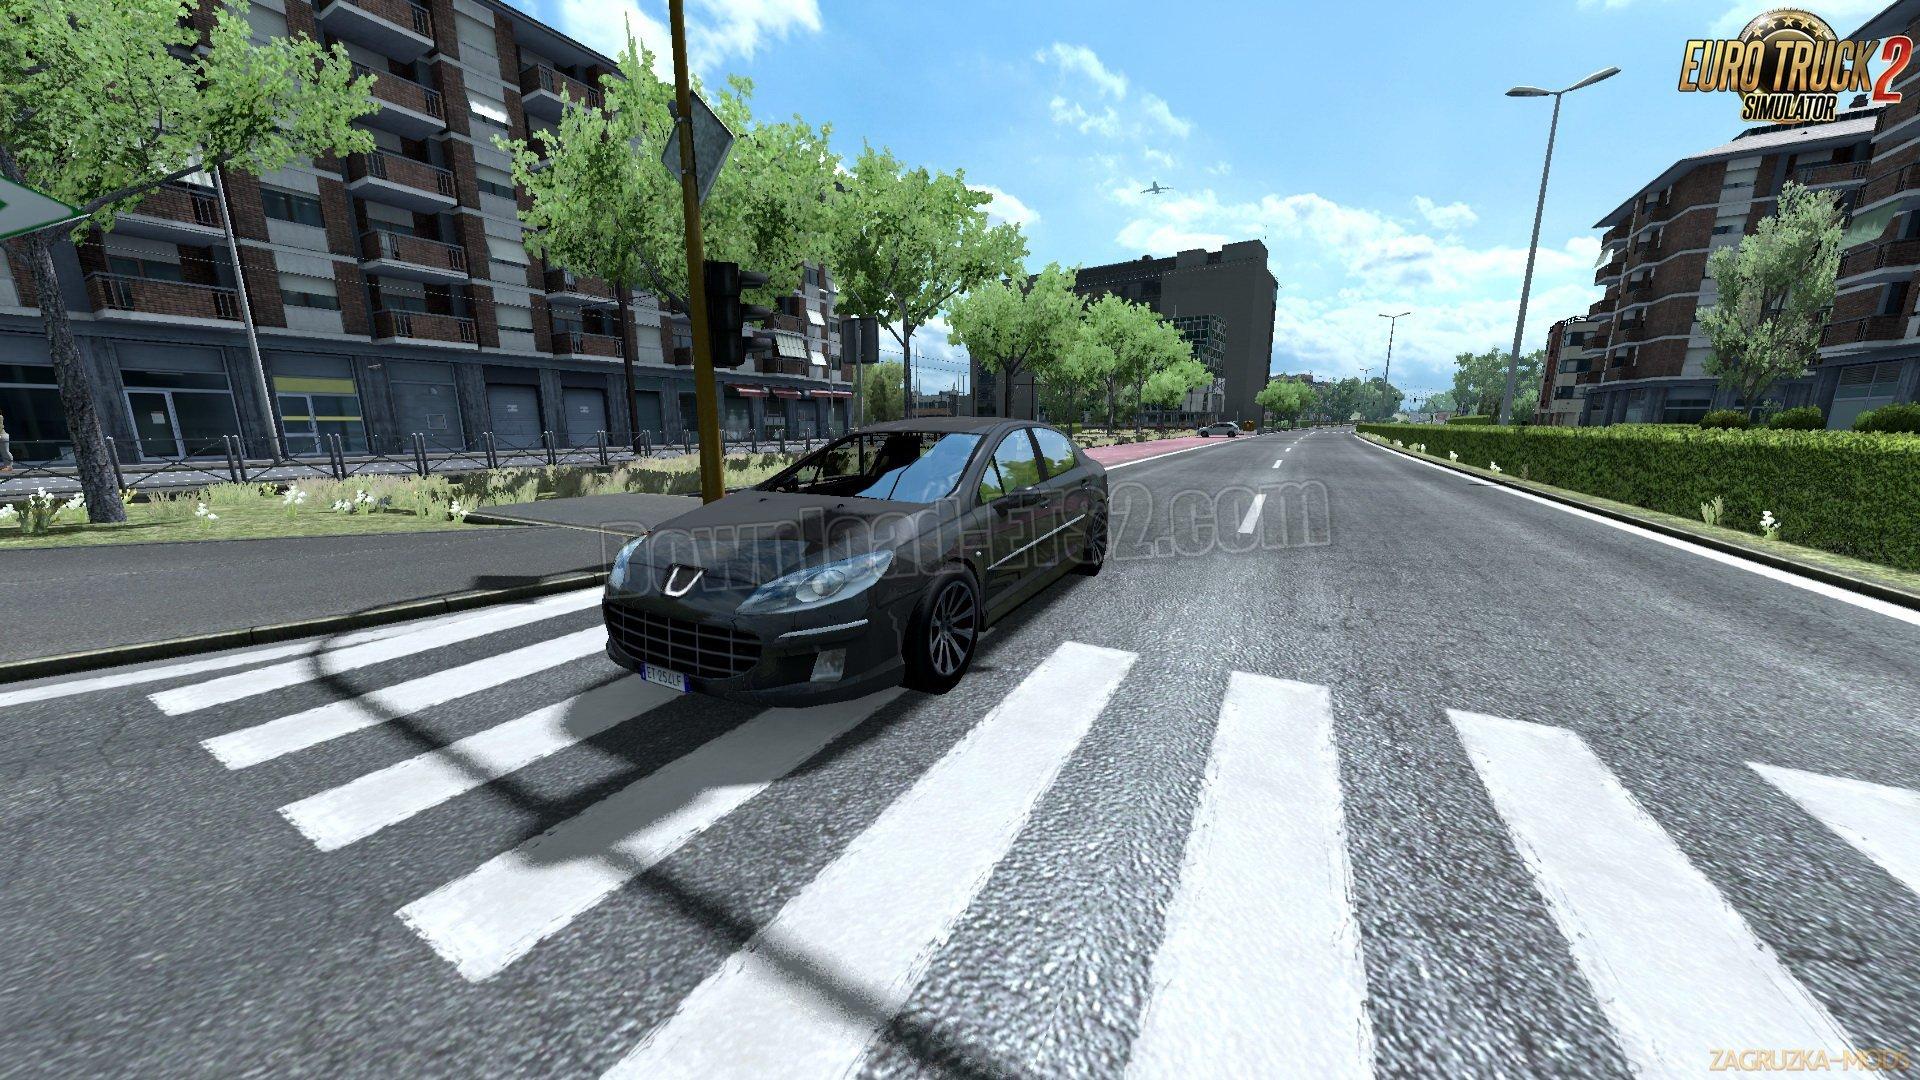 Realistic Graphics Mod v2 0 by Berat Afşin (1 32 x) for ETS 2